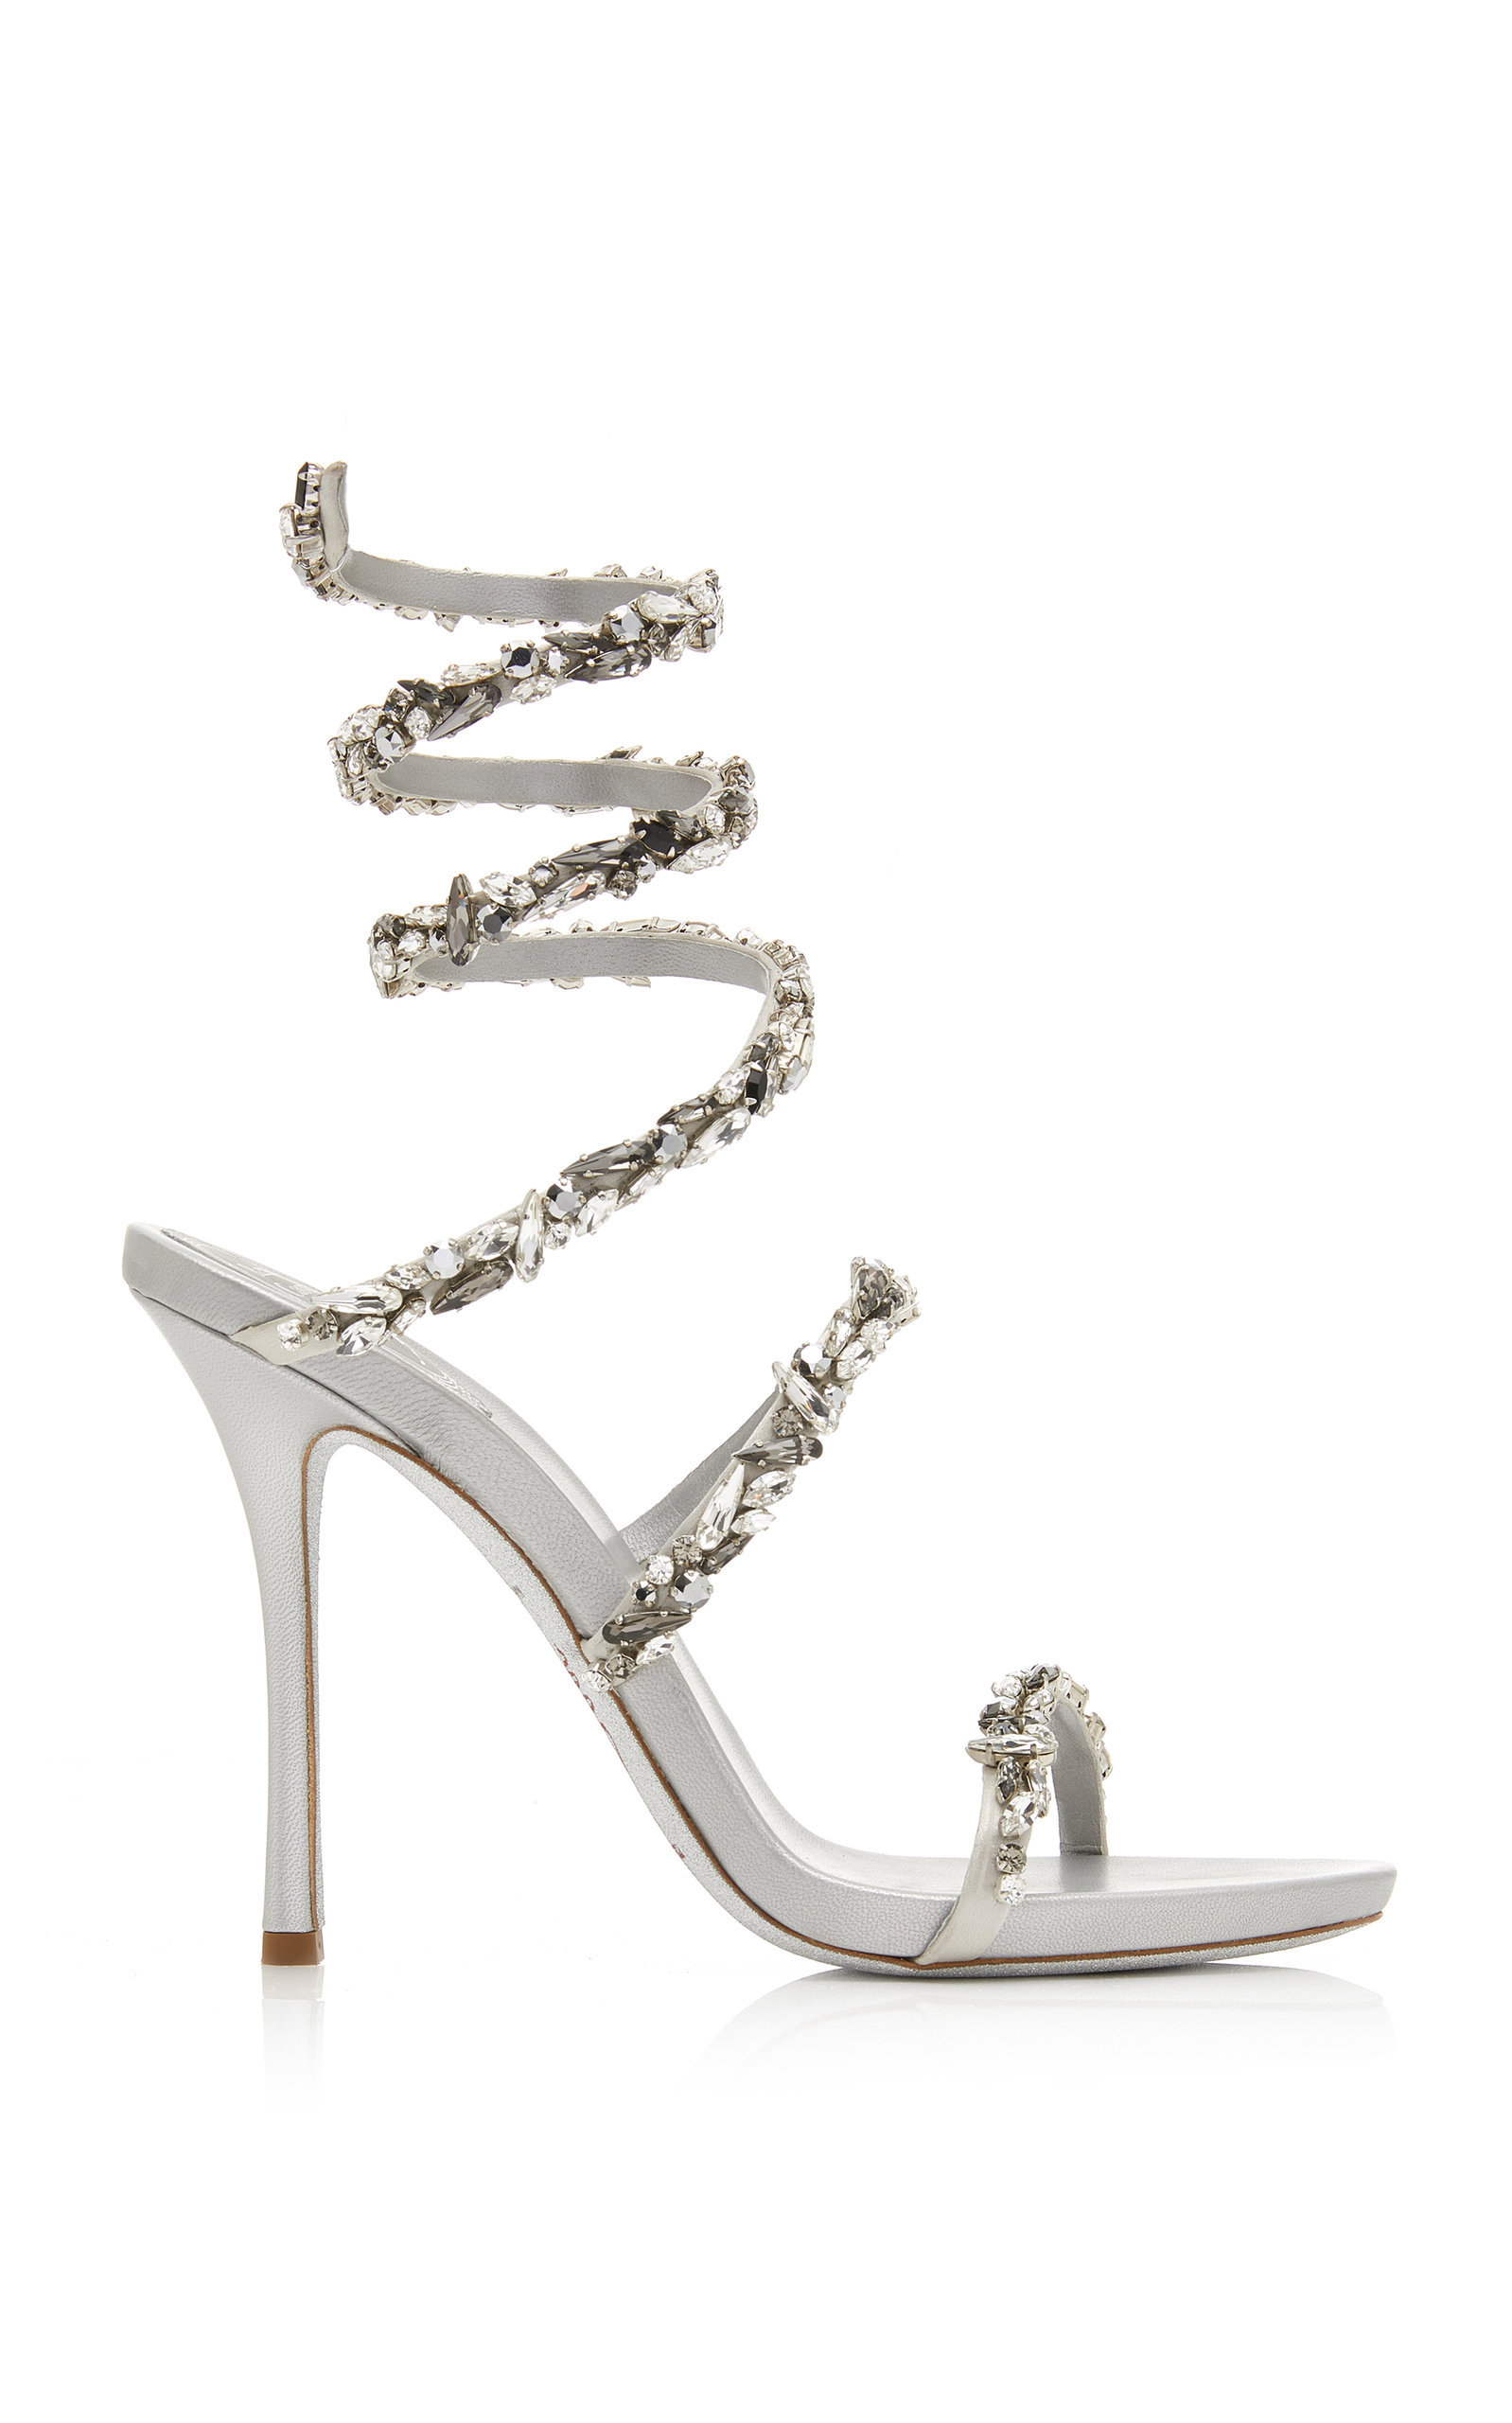 c9ff04977 RenÉ Caovilla Crystal-Embellished Satin Snake-Coil Sandals In Silver ...